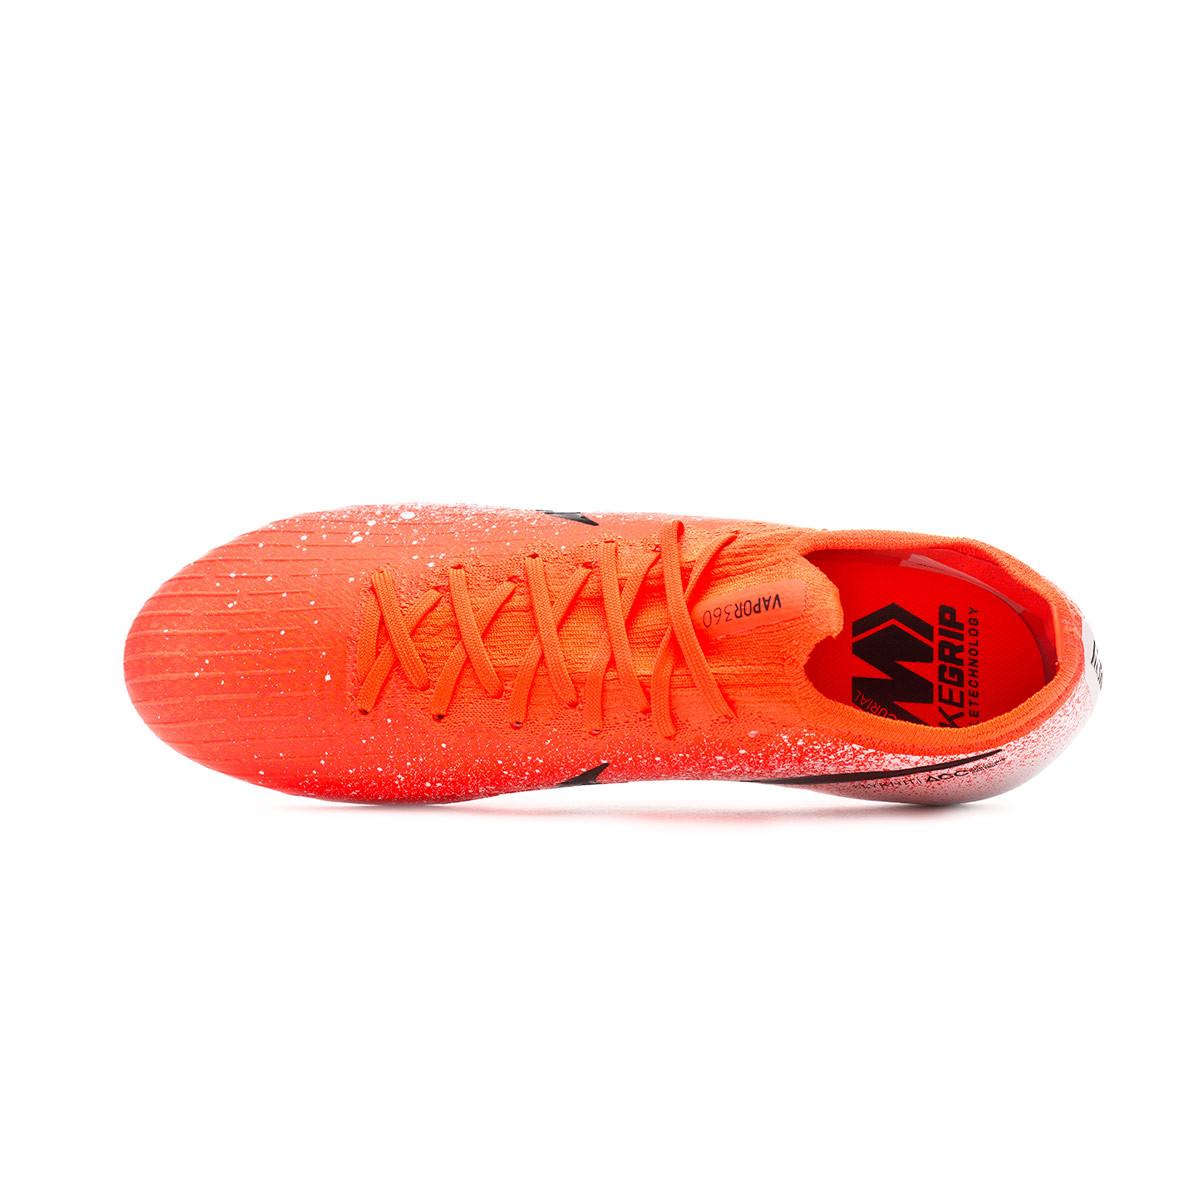 6b8972d4c7eb Football Boots Nike Mercurial Vapor XII Elite FG Hyper crimson-Black-White  - Tienda de fútbol Fútbol Emotion